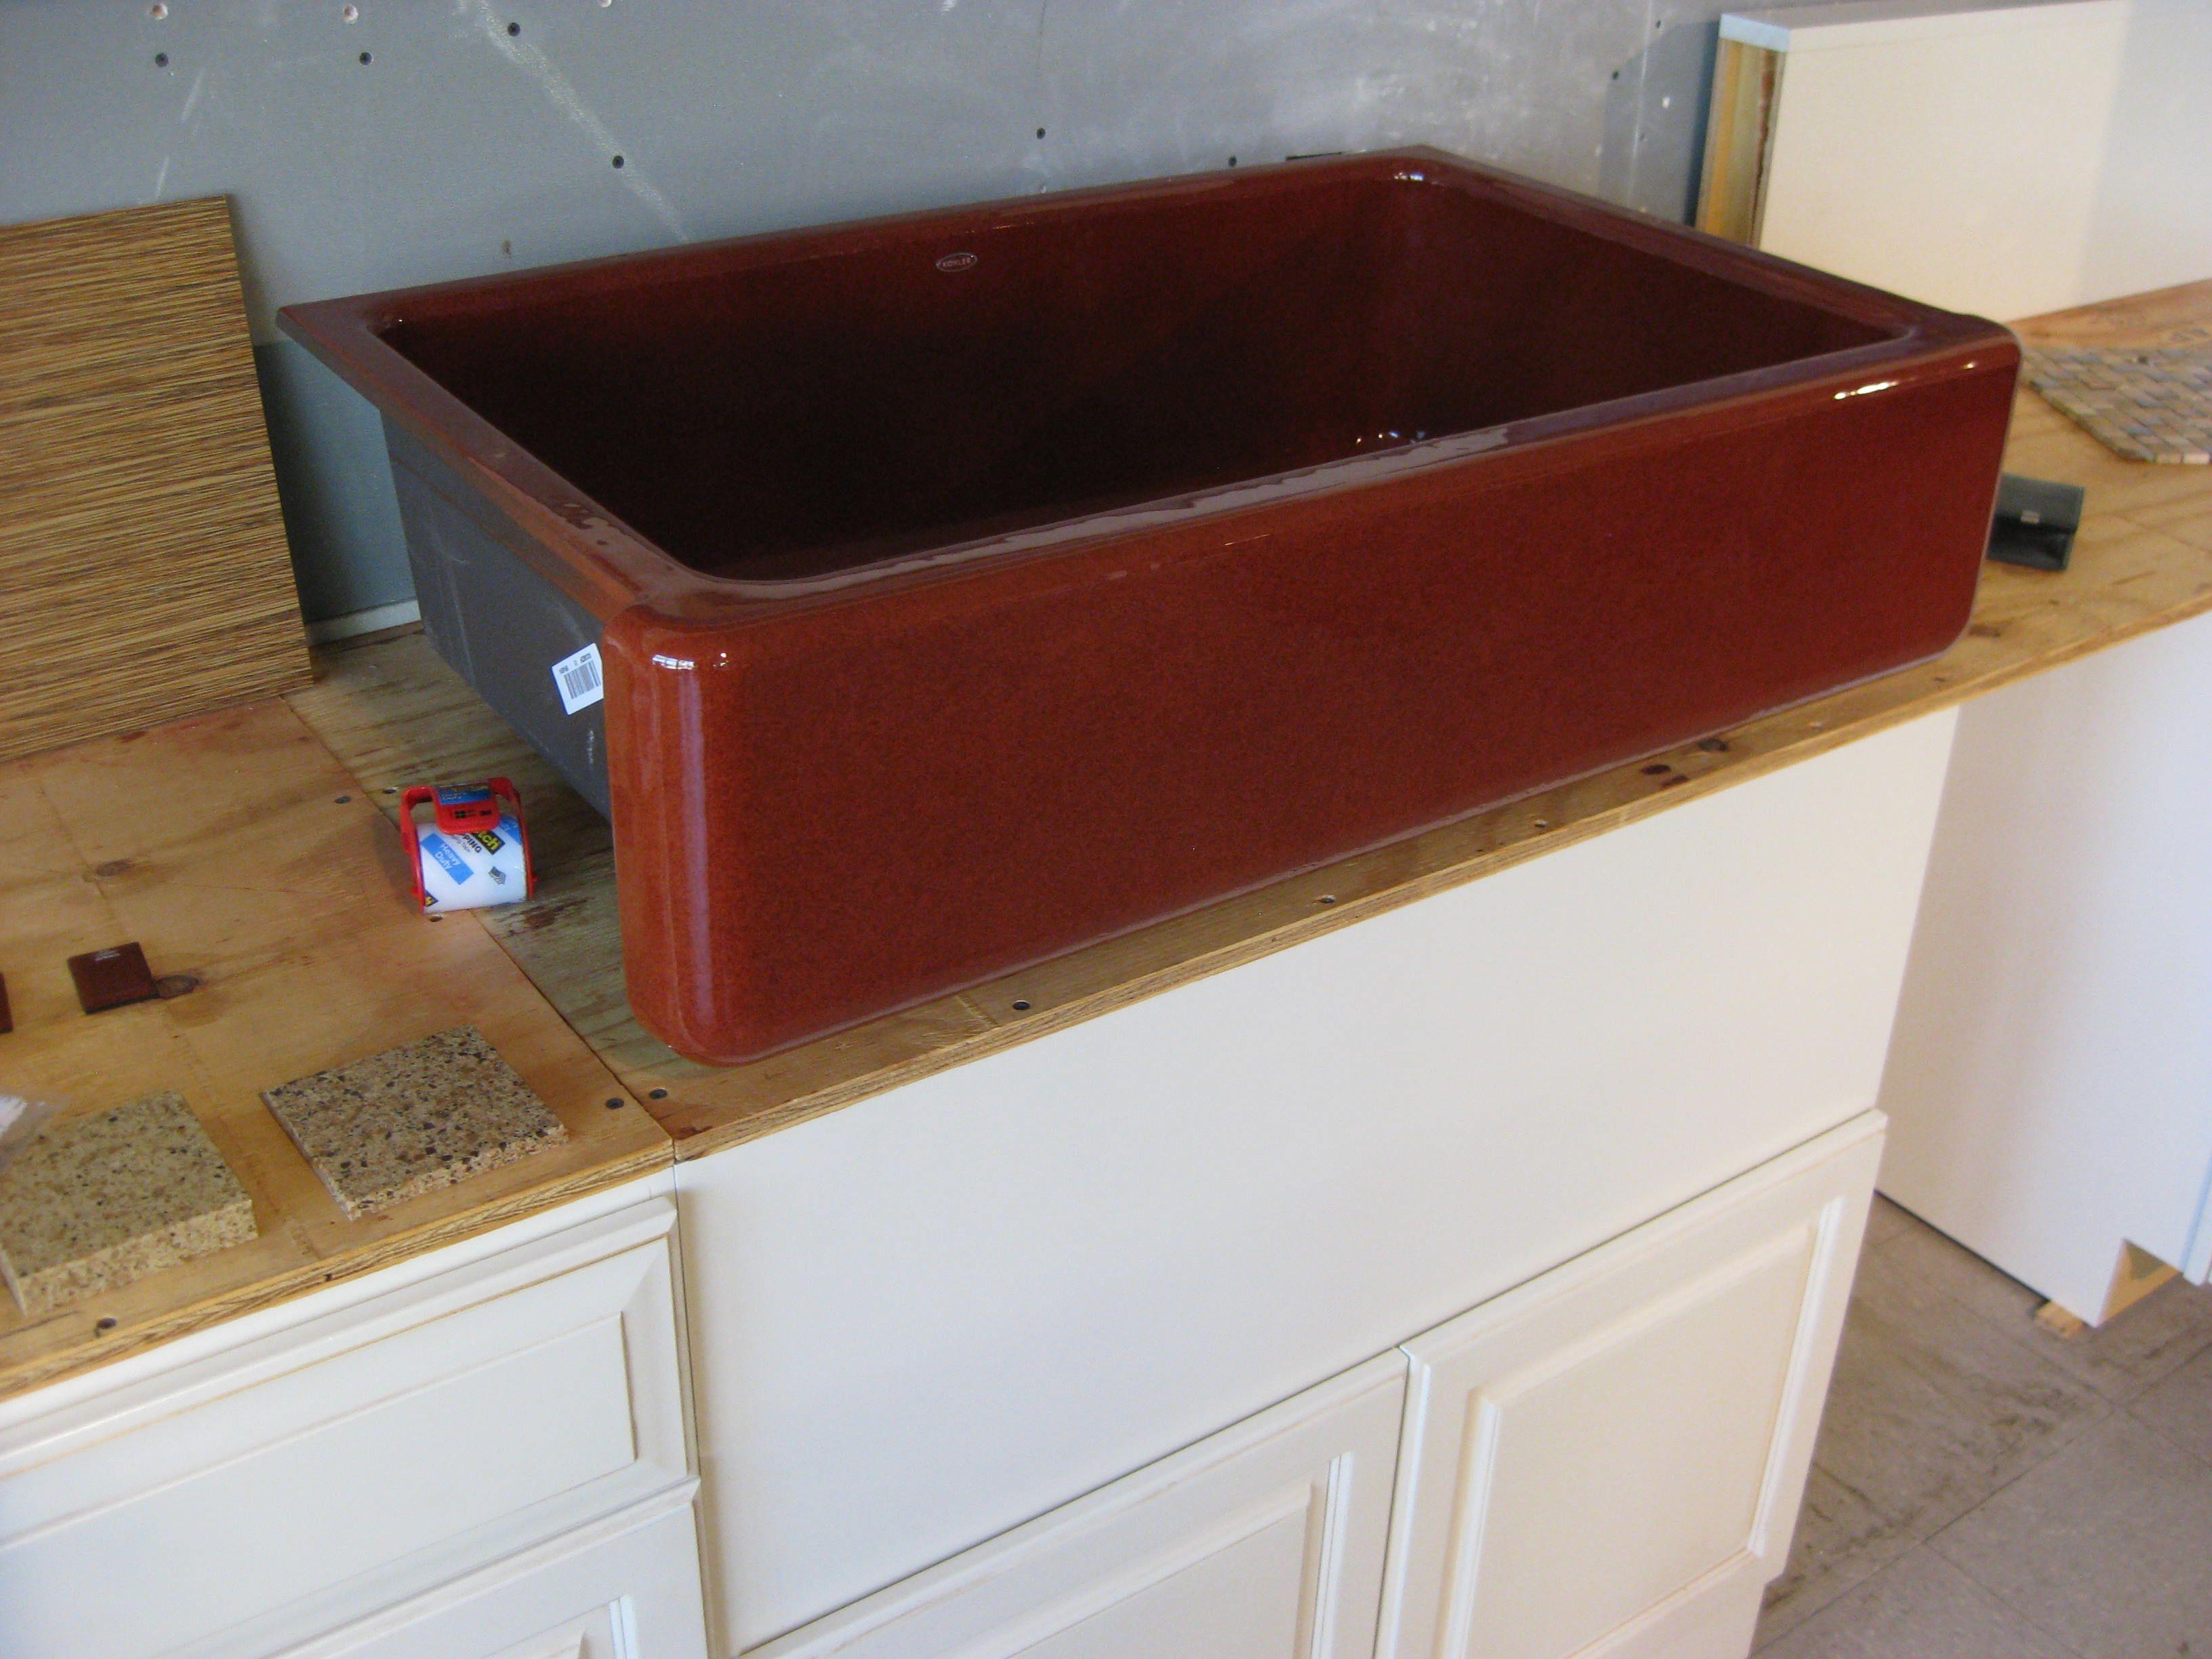 Thar she blows The massive Kohler Ember color cast iron kitchen